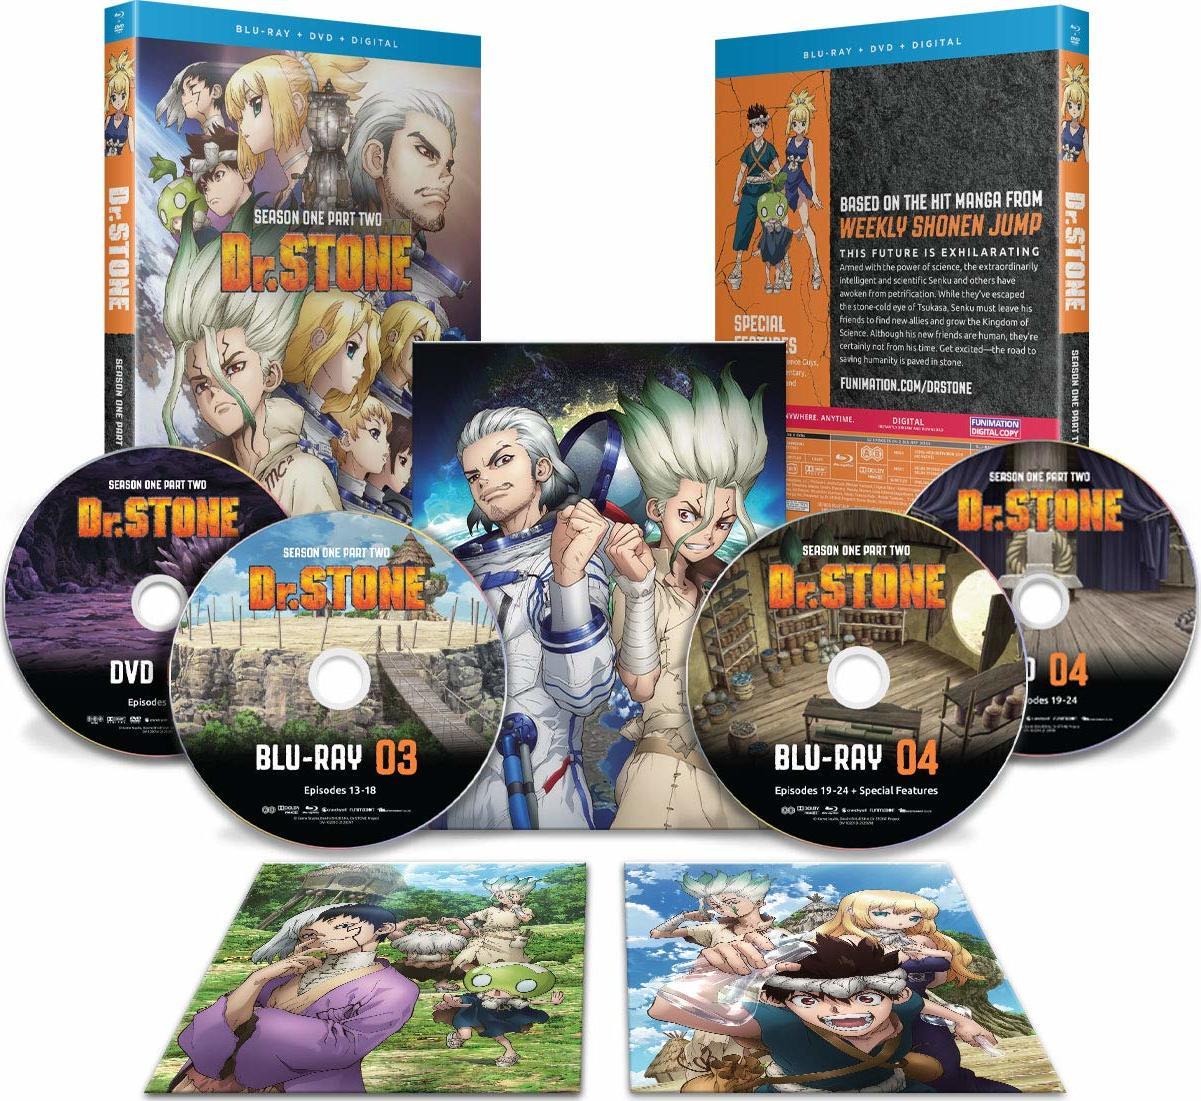 Dr Stone Season One Part Two Blu Ray Release Date December 1 2020 Blu Ray Dvd Digital